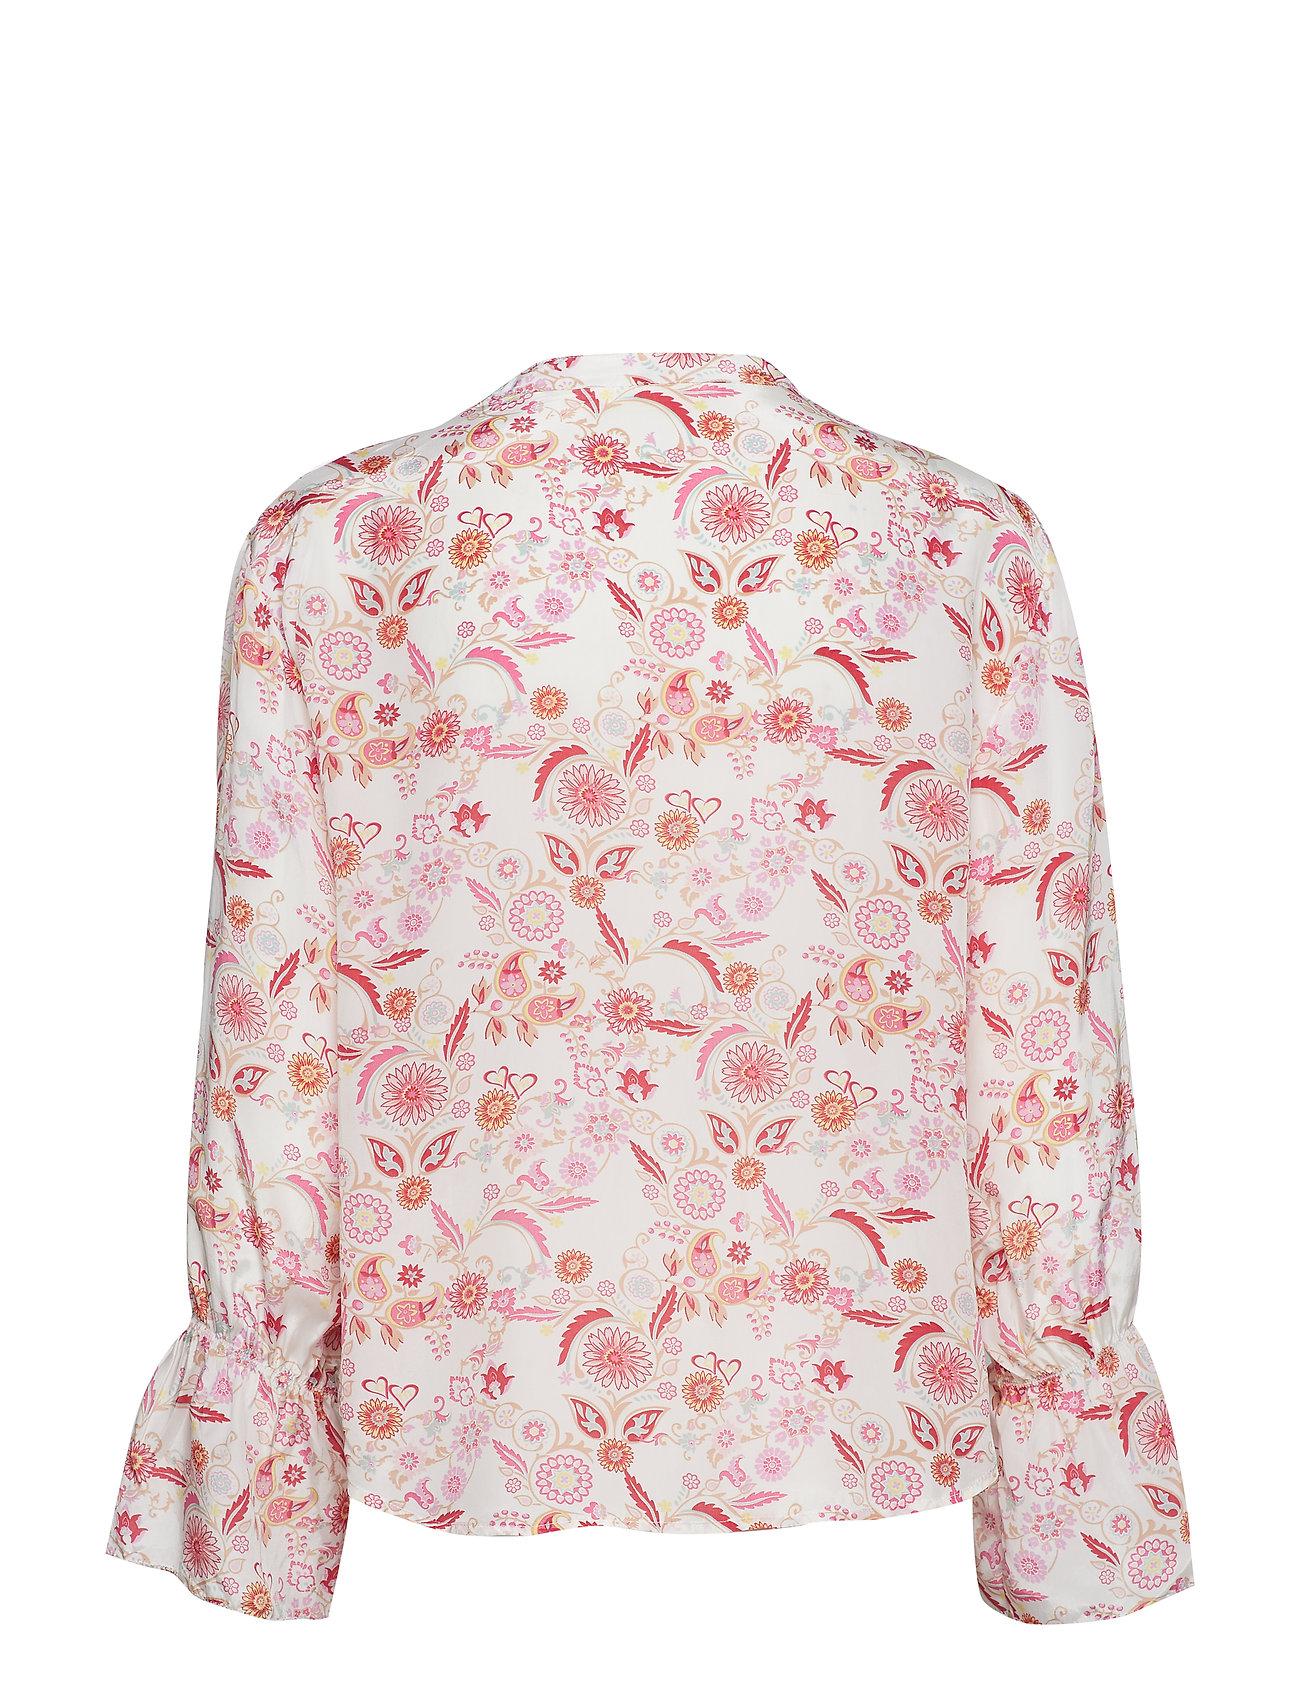 Molly Blossom Chalk Blouselight Blouselight Chalk Blossom MultiOdd SzUGVqMp